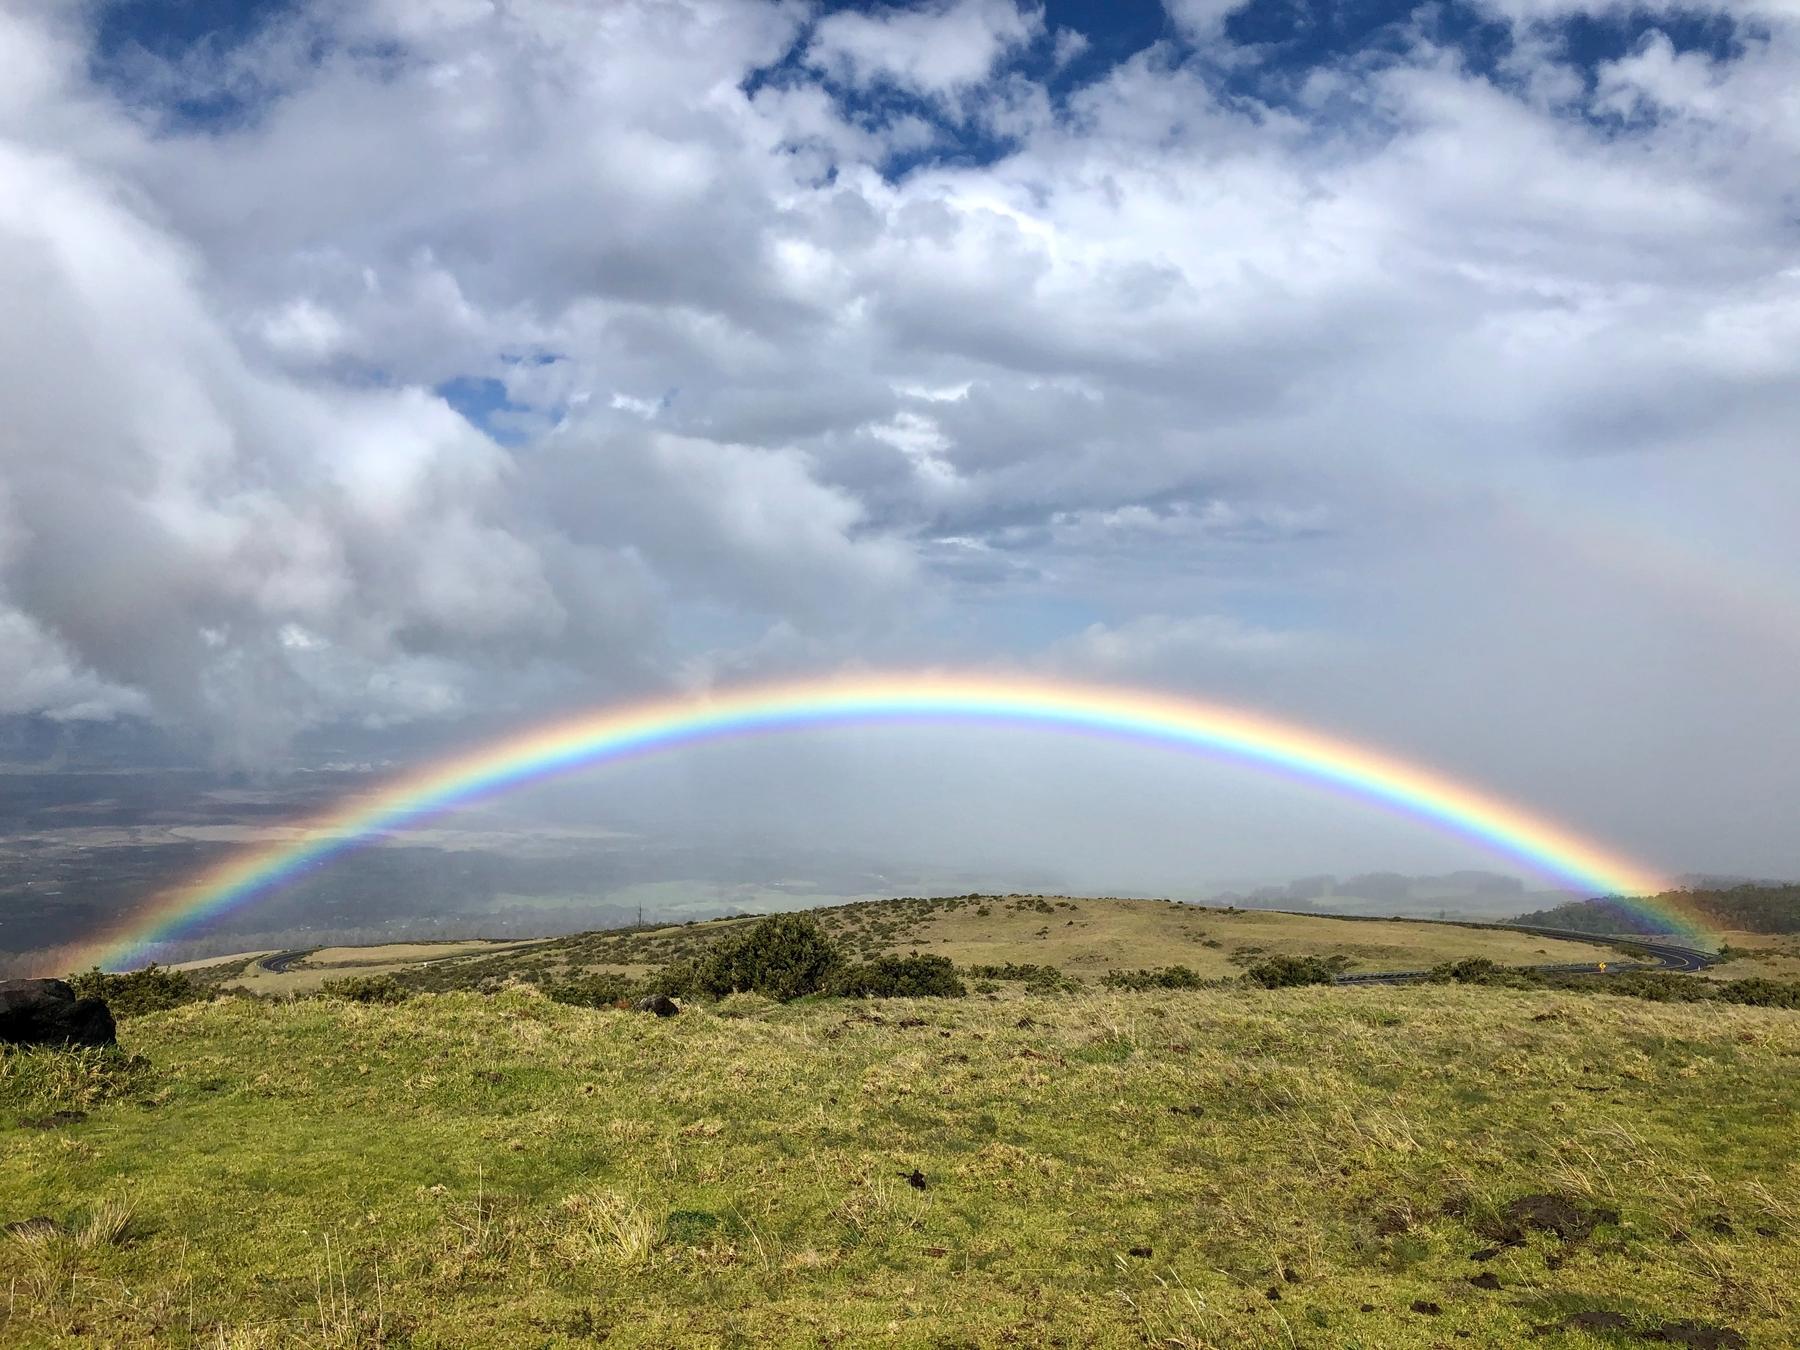 Rainbow on the road leading up to Haleakalā Crater.